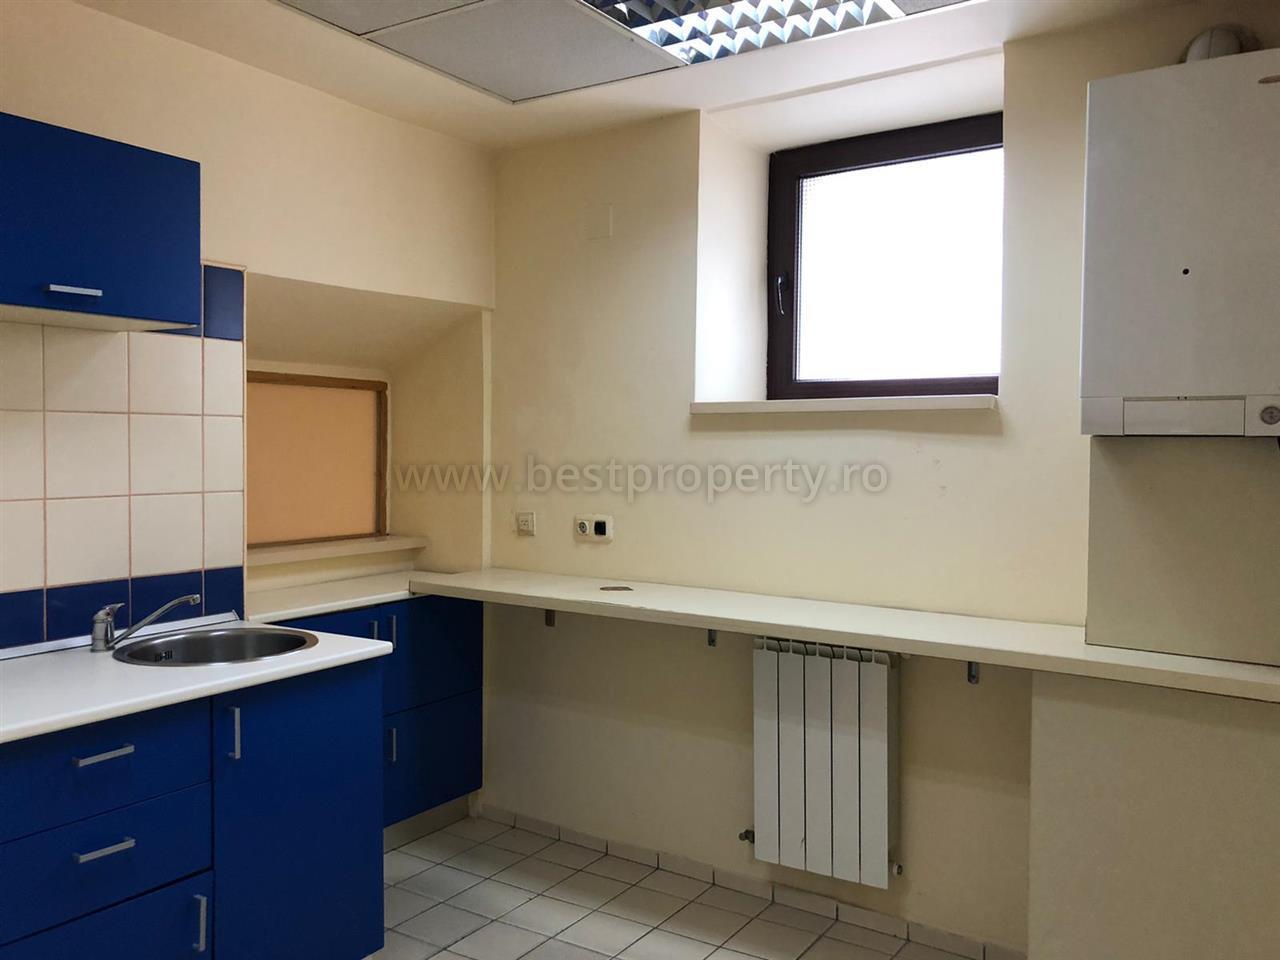 Ultracentral - Spatiu Comercial de inchiriat in Sibiu zona Piata Mare